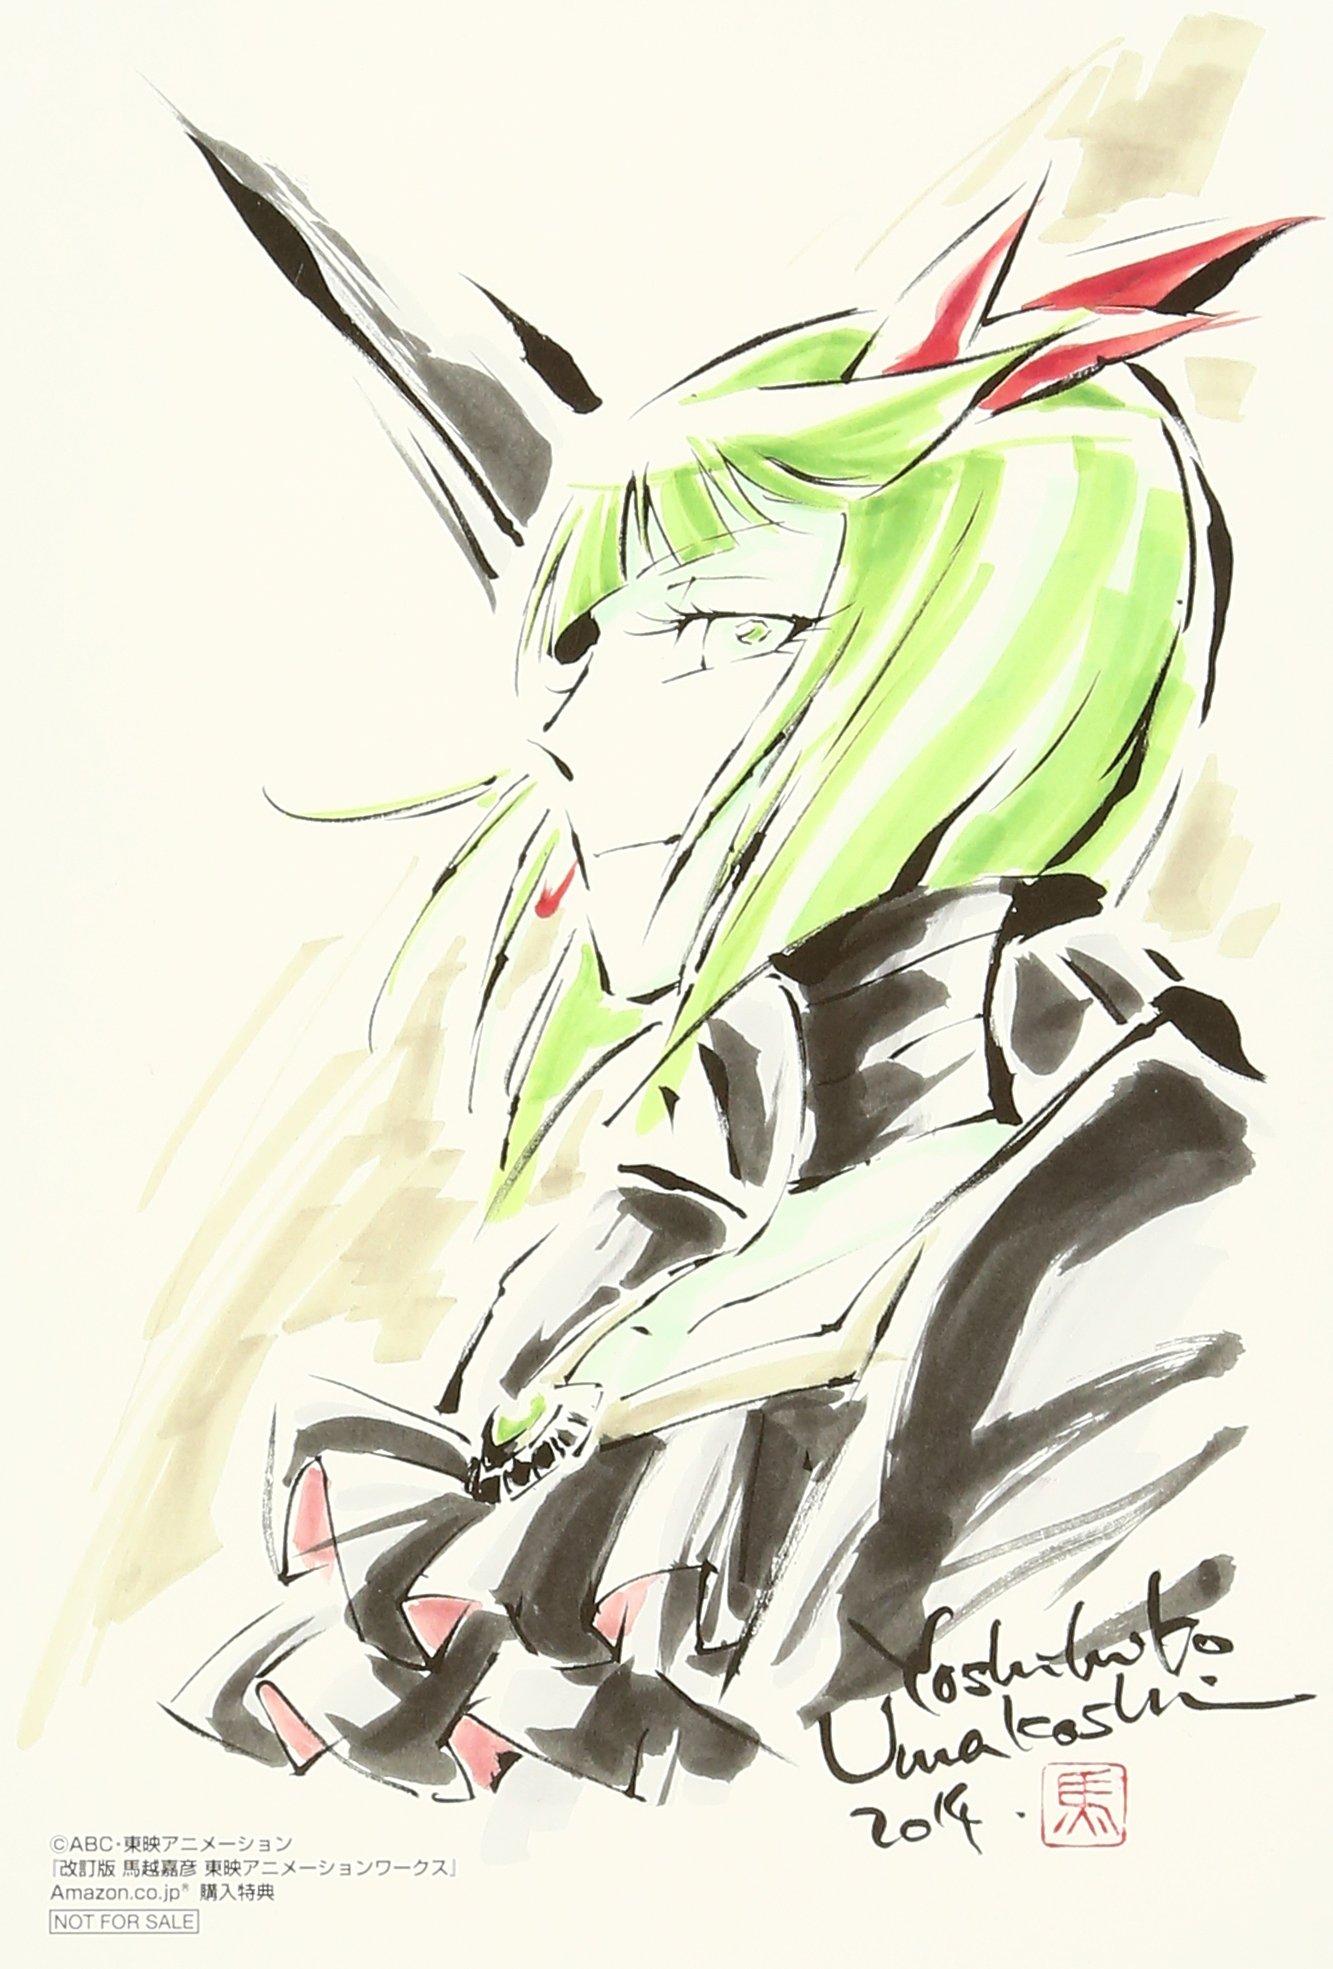 Umakoshi Yoshihiko Toei Animation Works (Revised Version